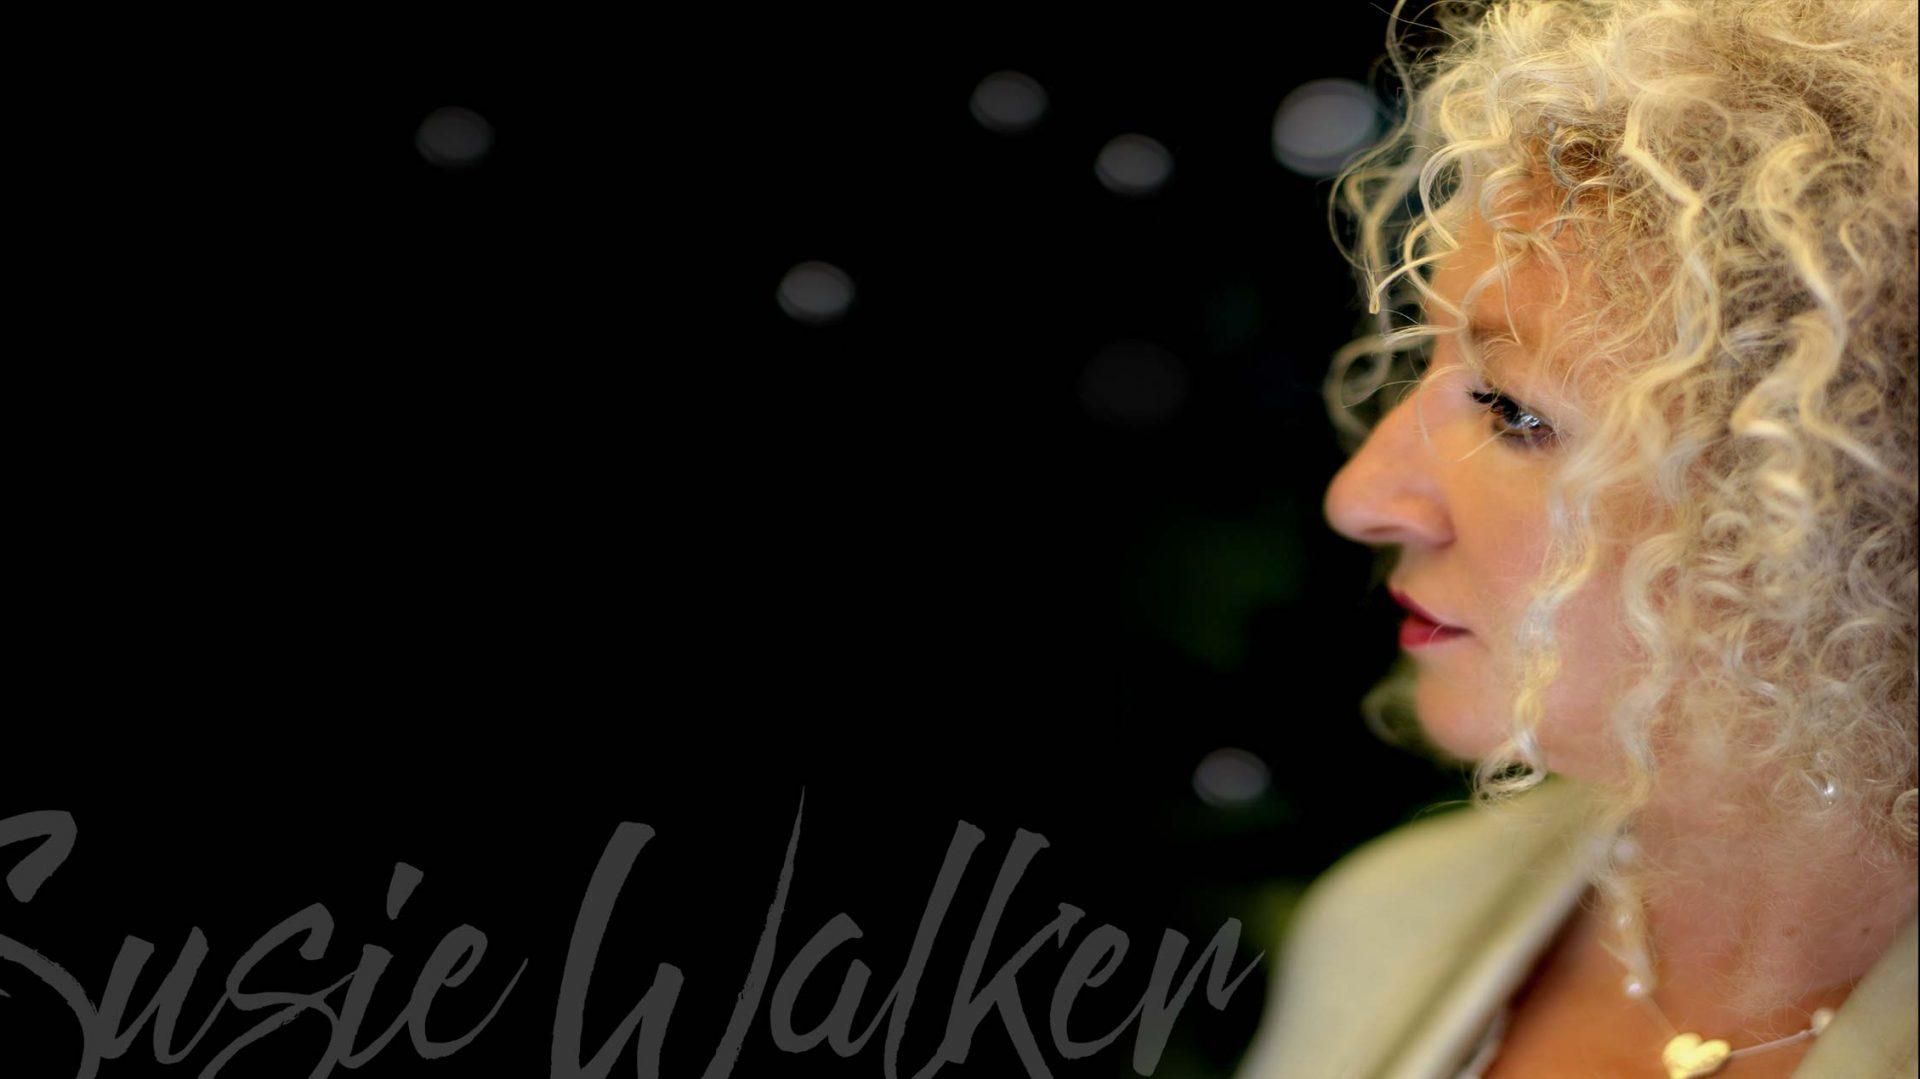 Susie Walker